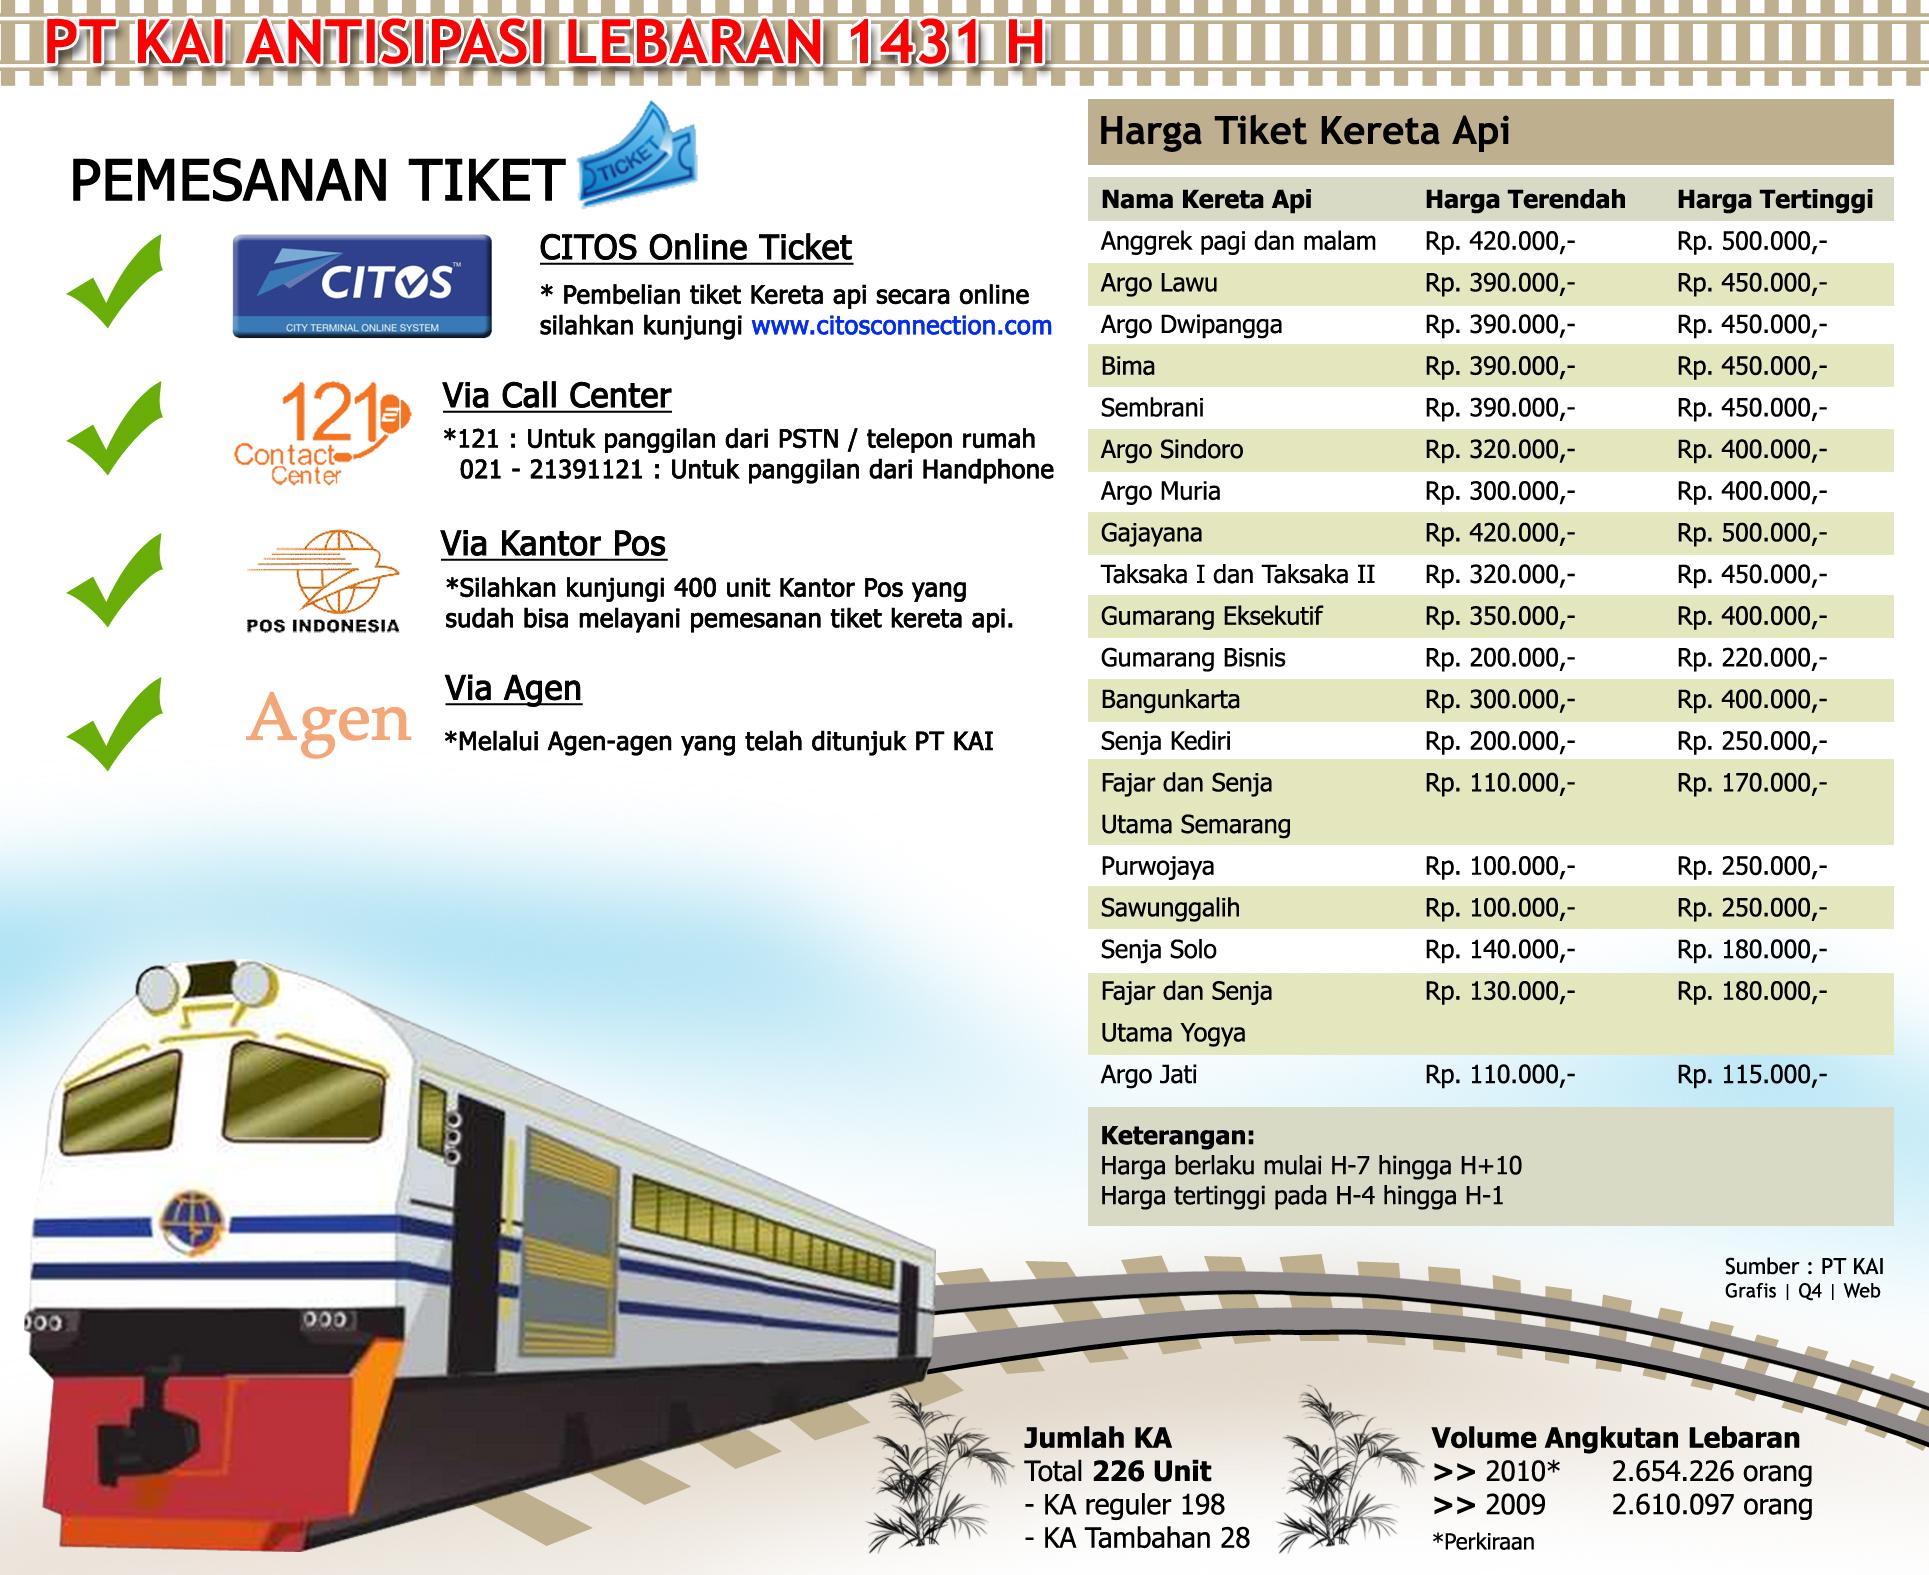 Harga Tiket Kereta Api Jelang Lebaran 2010 | Conans MAN 1